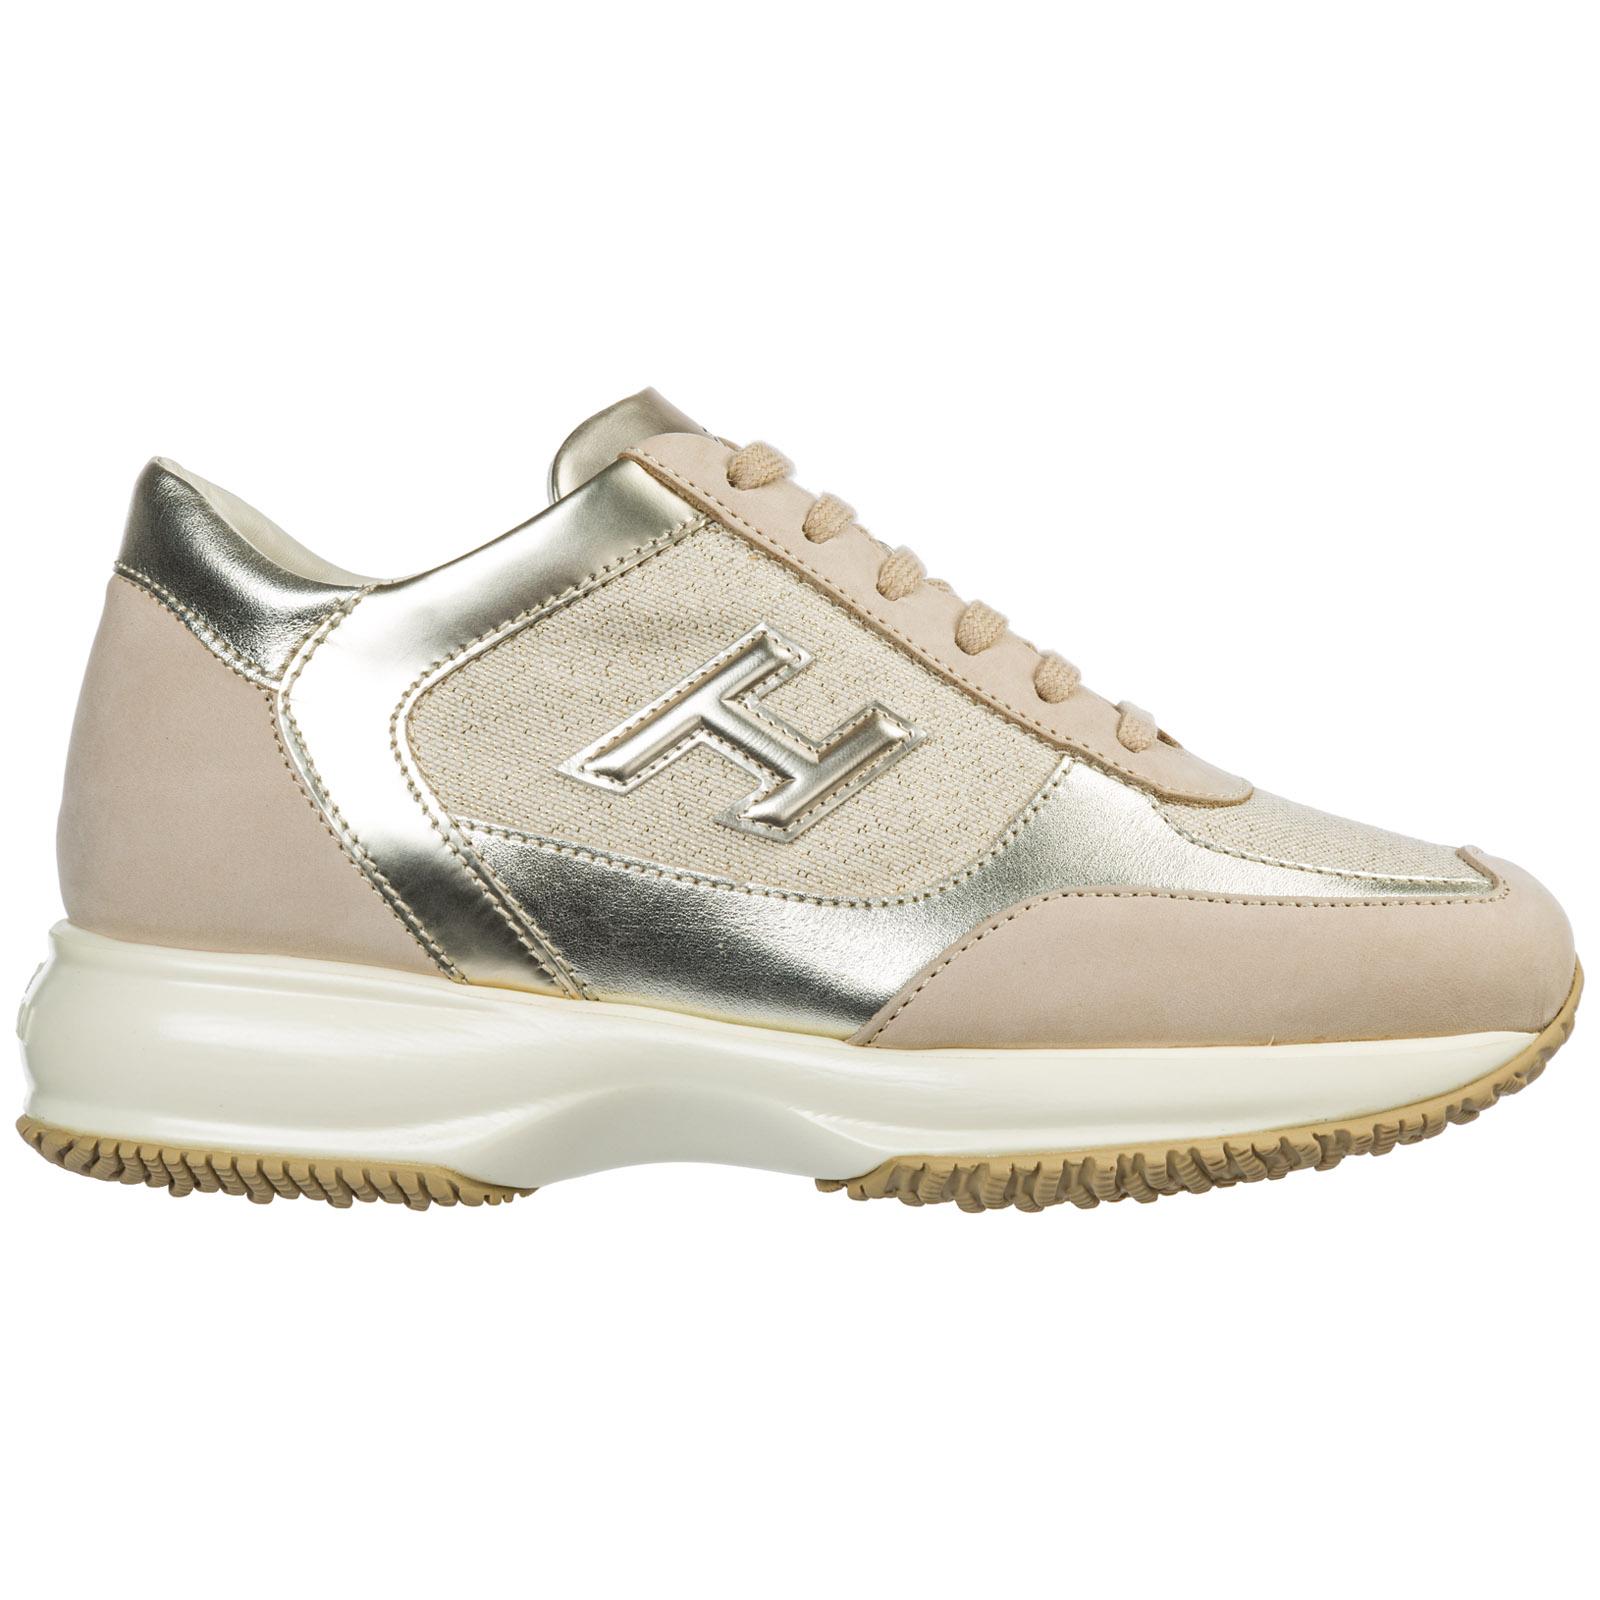 the best attitude 3b3f6 75ef2 Scarpe sneakers donna in pelle interactive